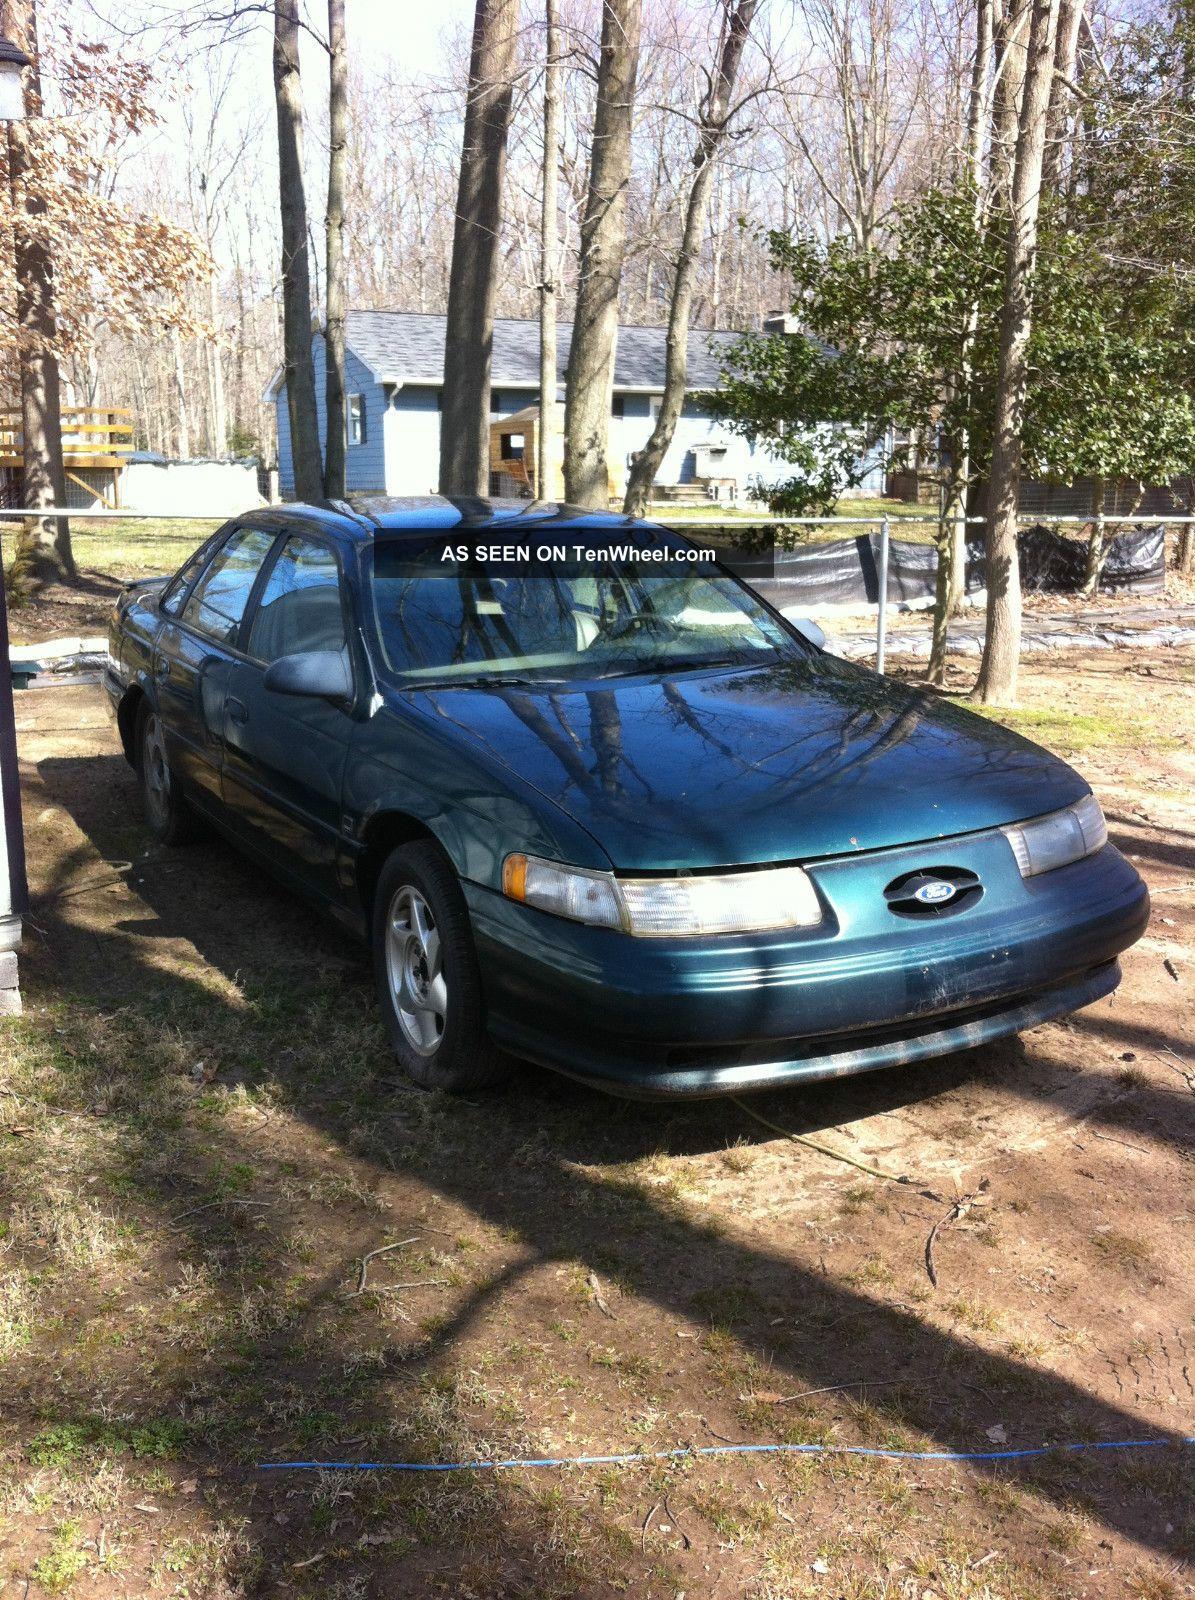 1993 ford taurus sho sedan 4 door 3 2l 1994 3 0 engine manual 2 rh tenwheel com 1997 Ford Taurus 1994 Ford Taurus